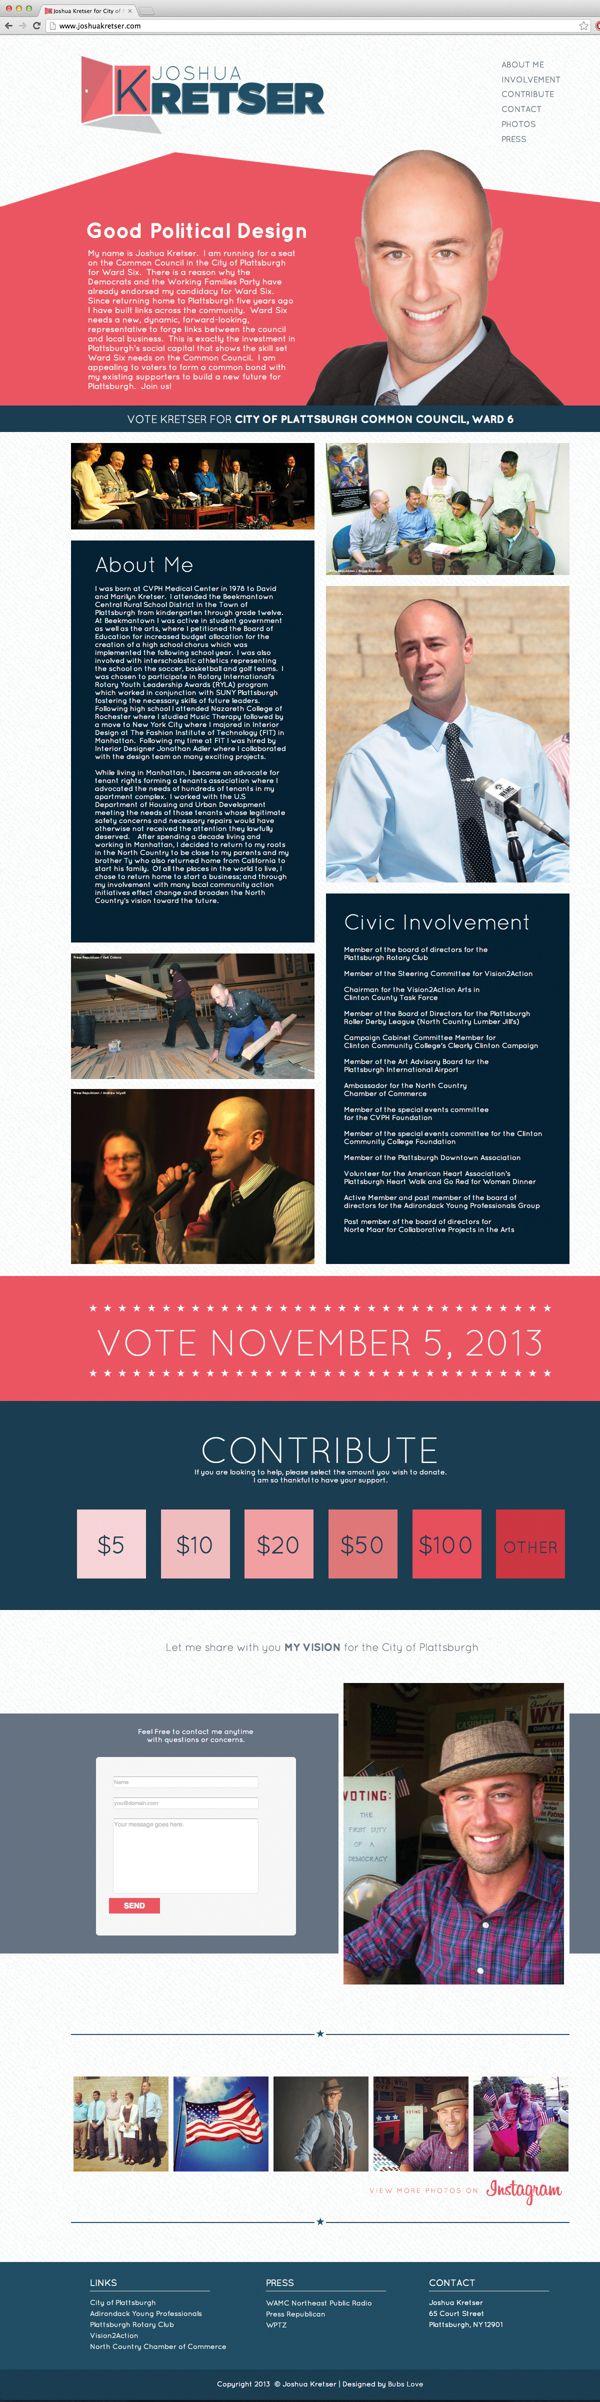 Joshua Kretser Political Campaign | Logo & Web Design by Mikey Lemieux, via Behance